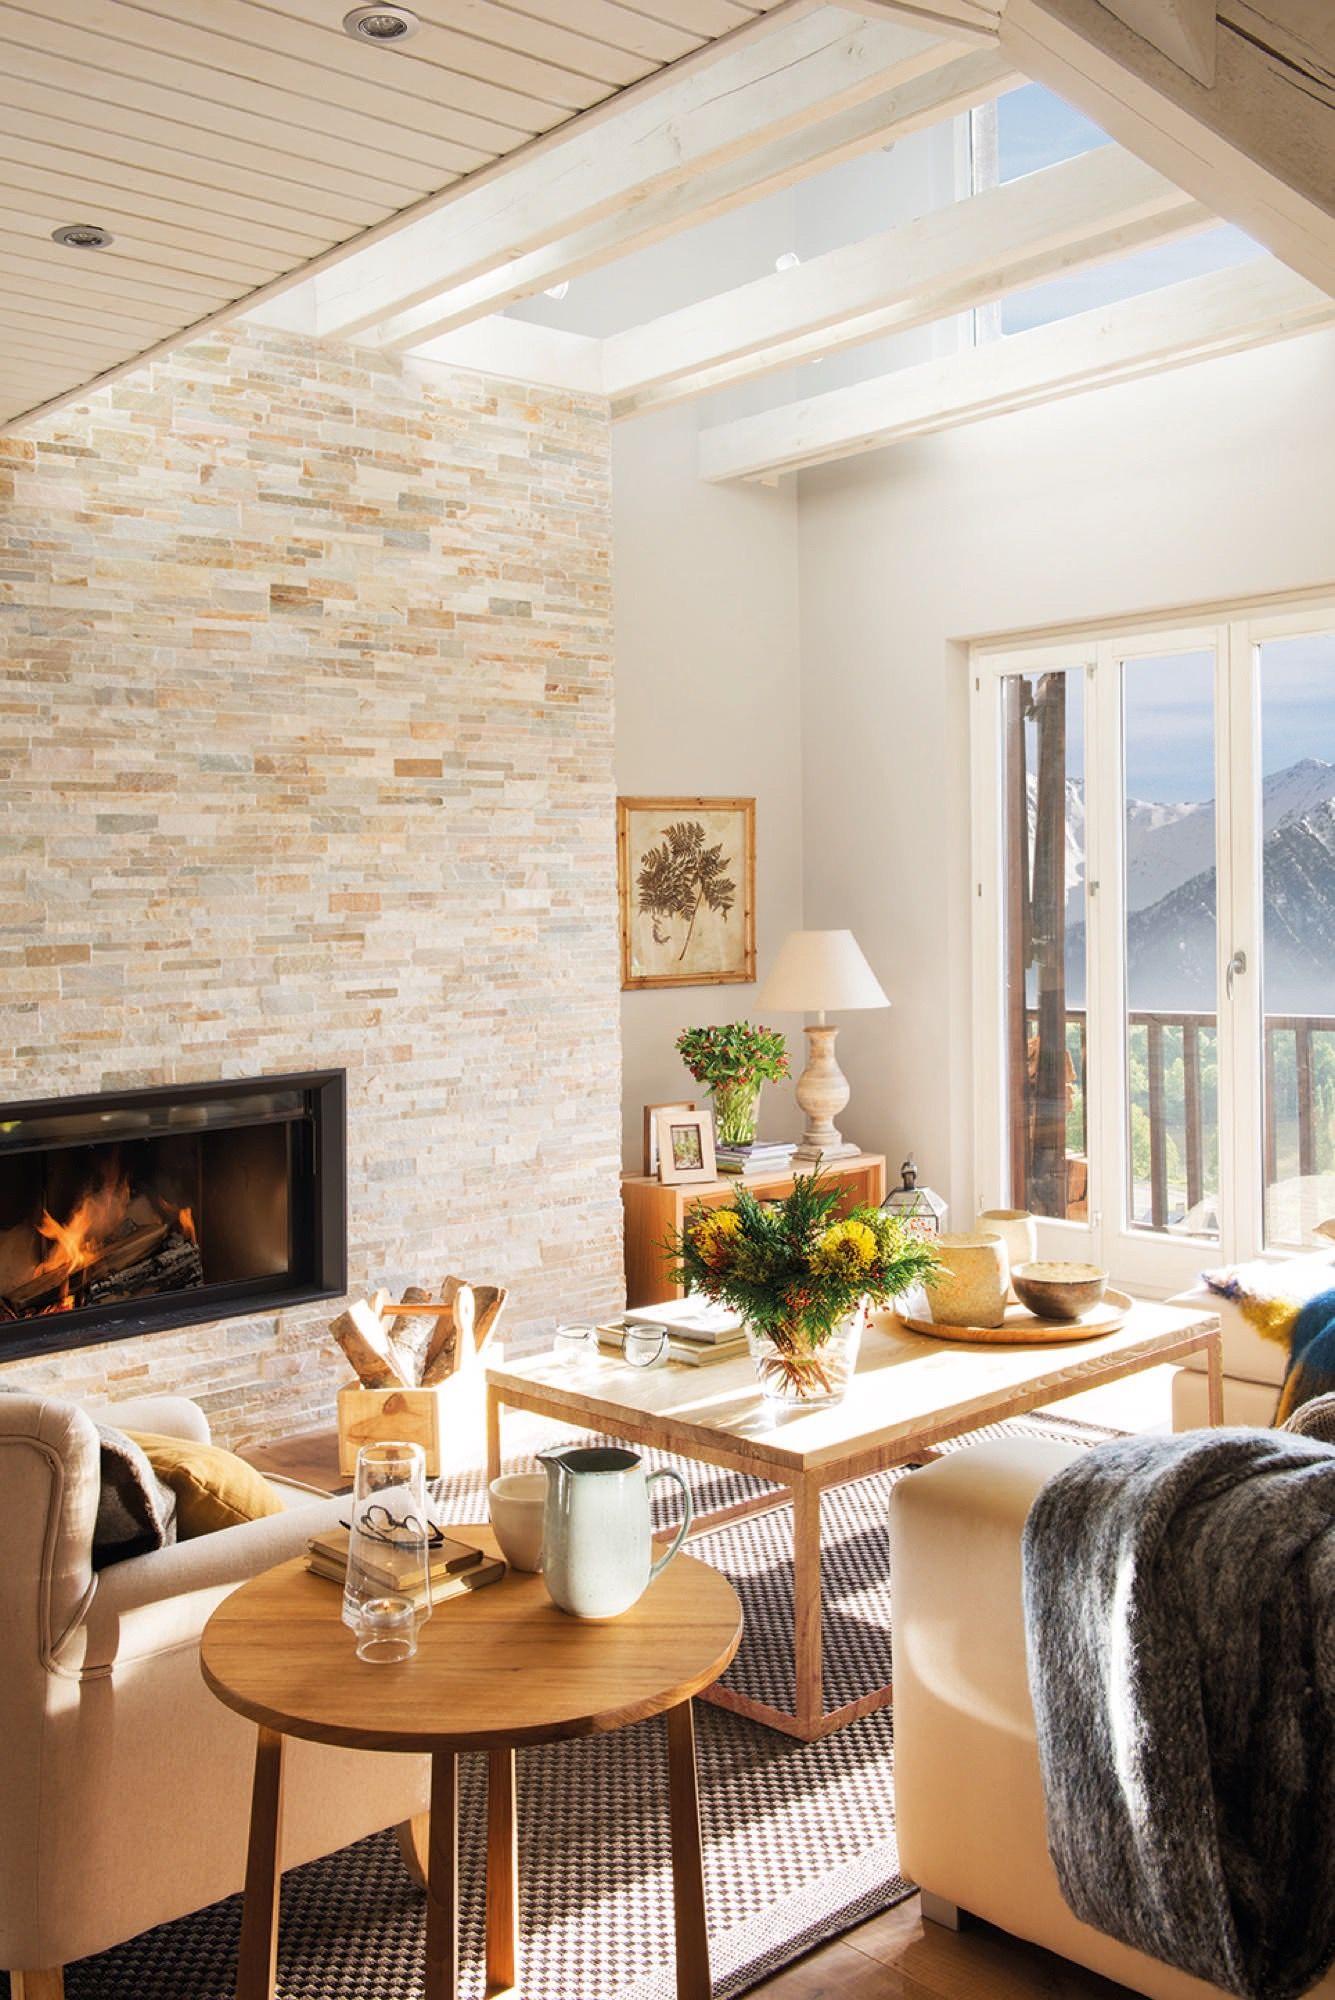 Salon con chimenea en un piso de monta a pinterest - Poner chimenea en un piso ...